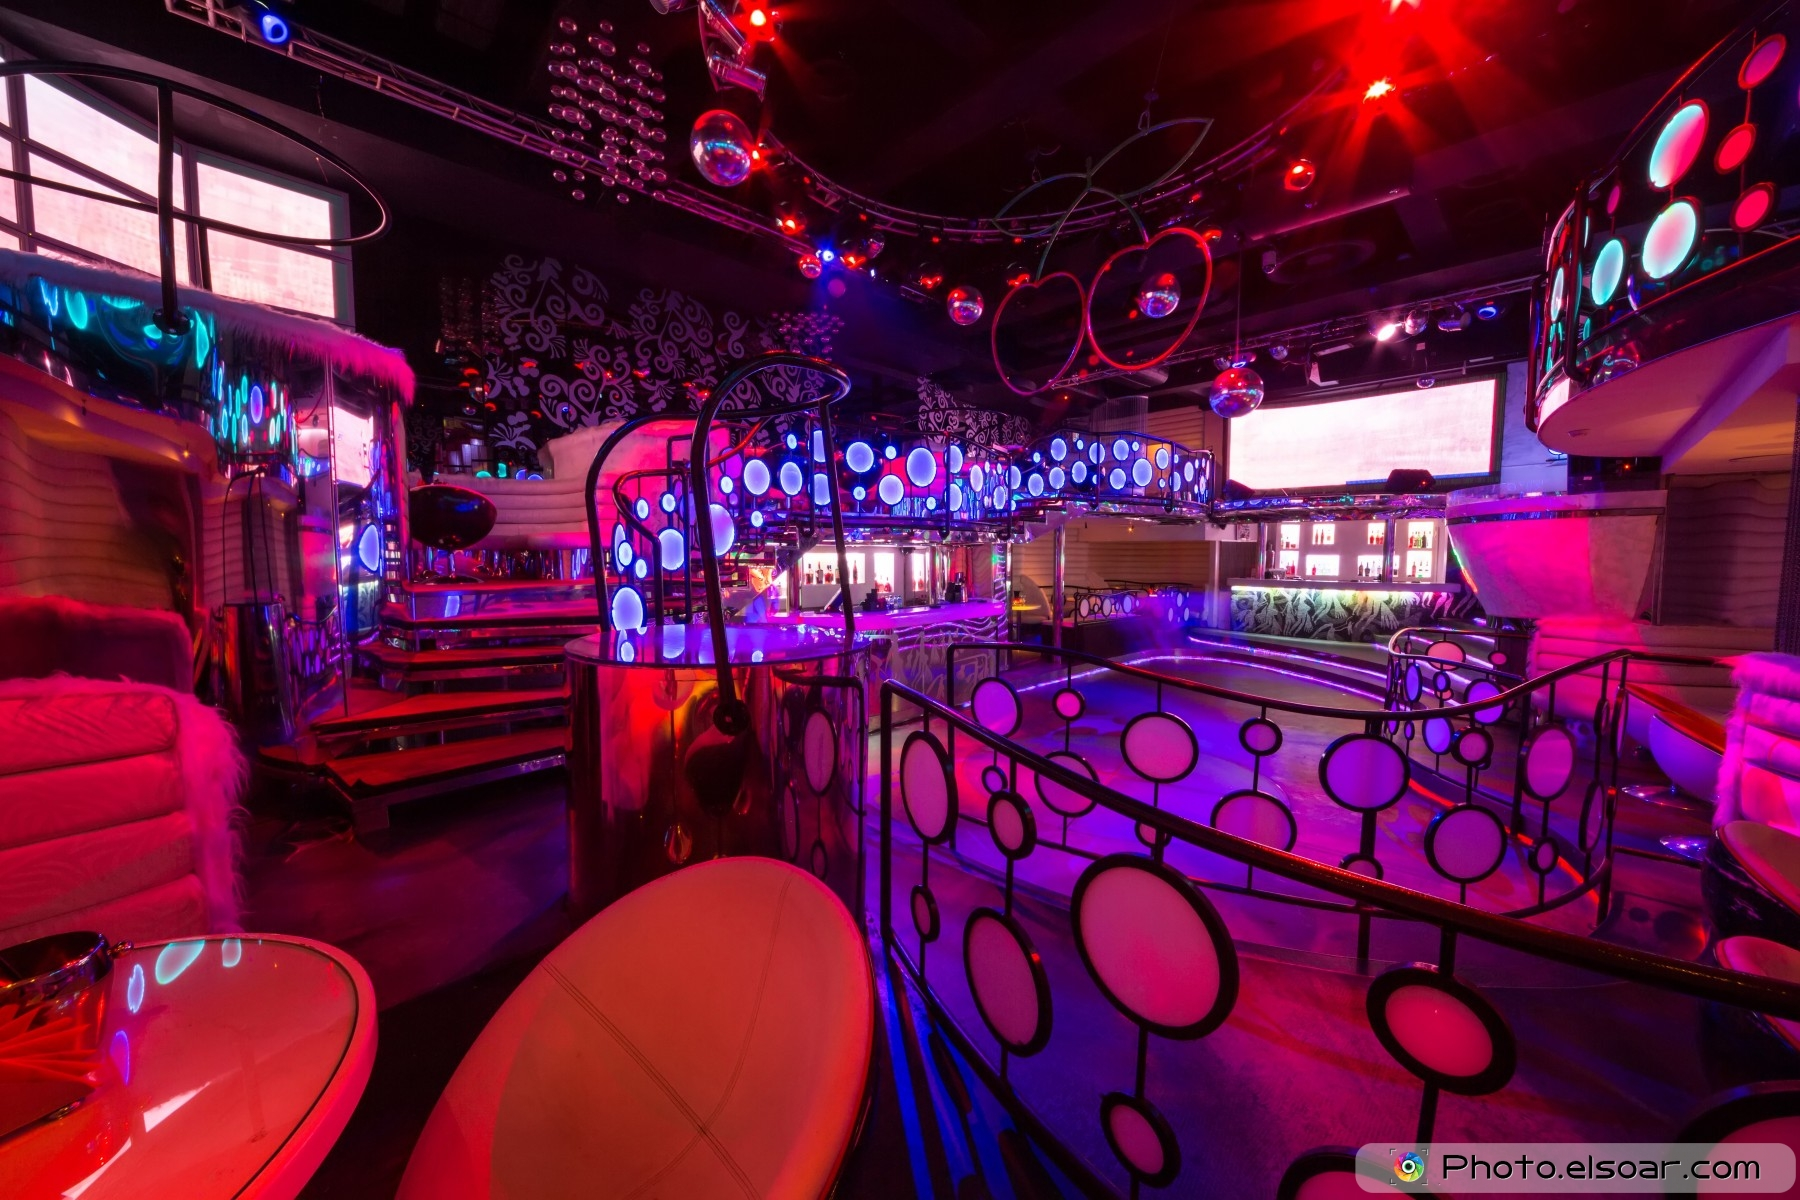 Nightclub Design Ideas - Home Design Ideas